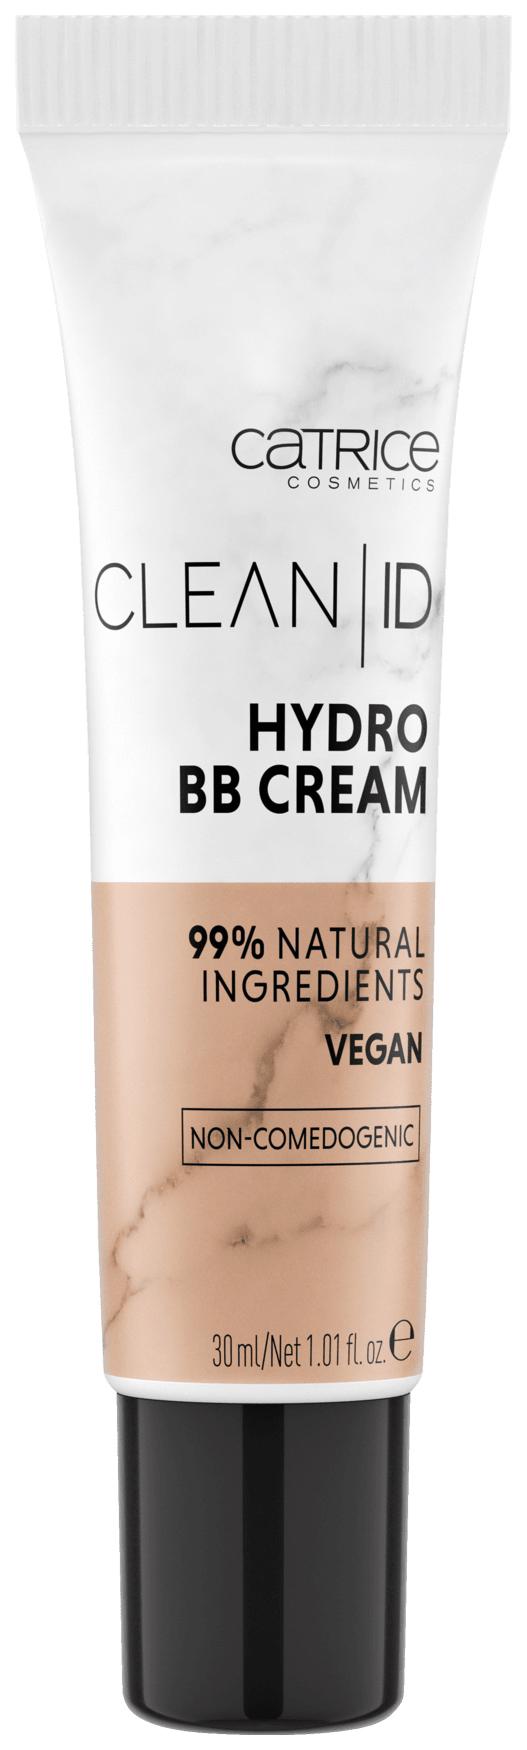 Основа тональная Catrice Clean ID Hydro BB Cream, 020 Medium